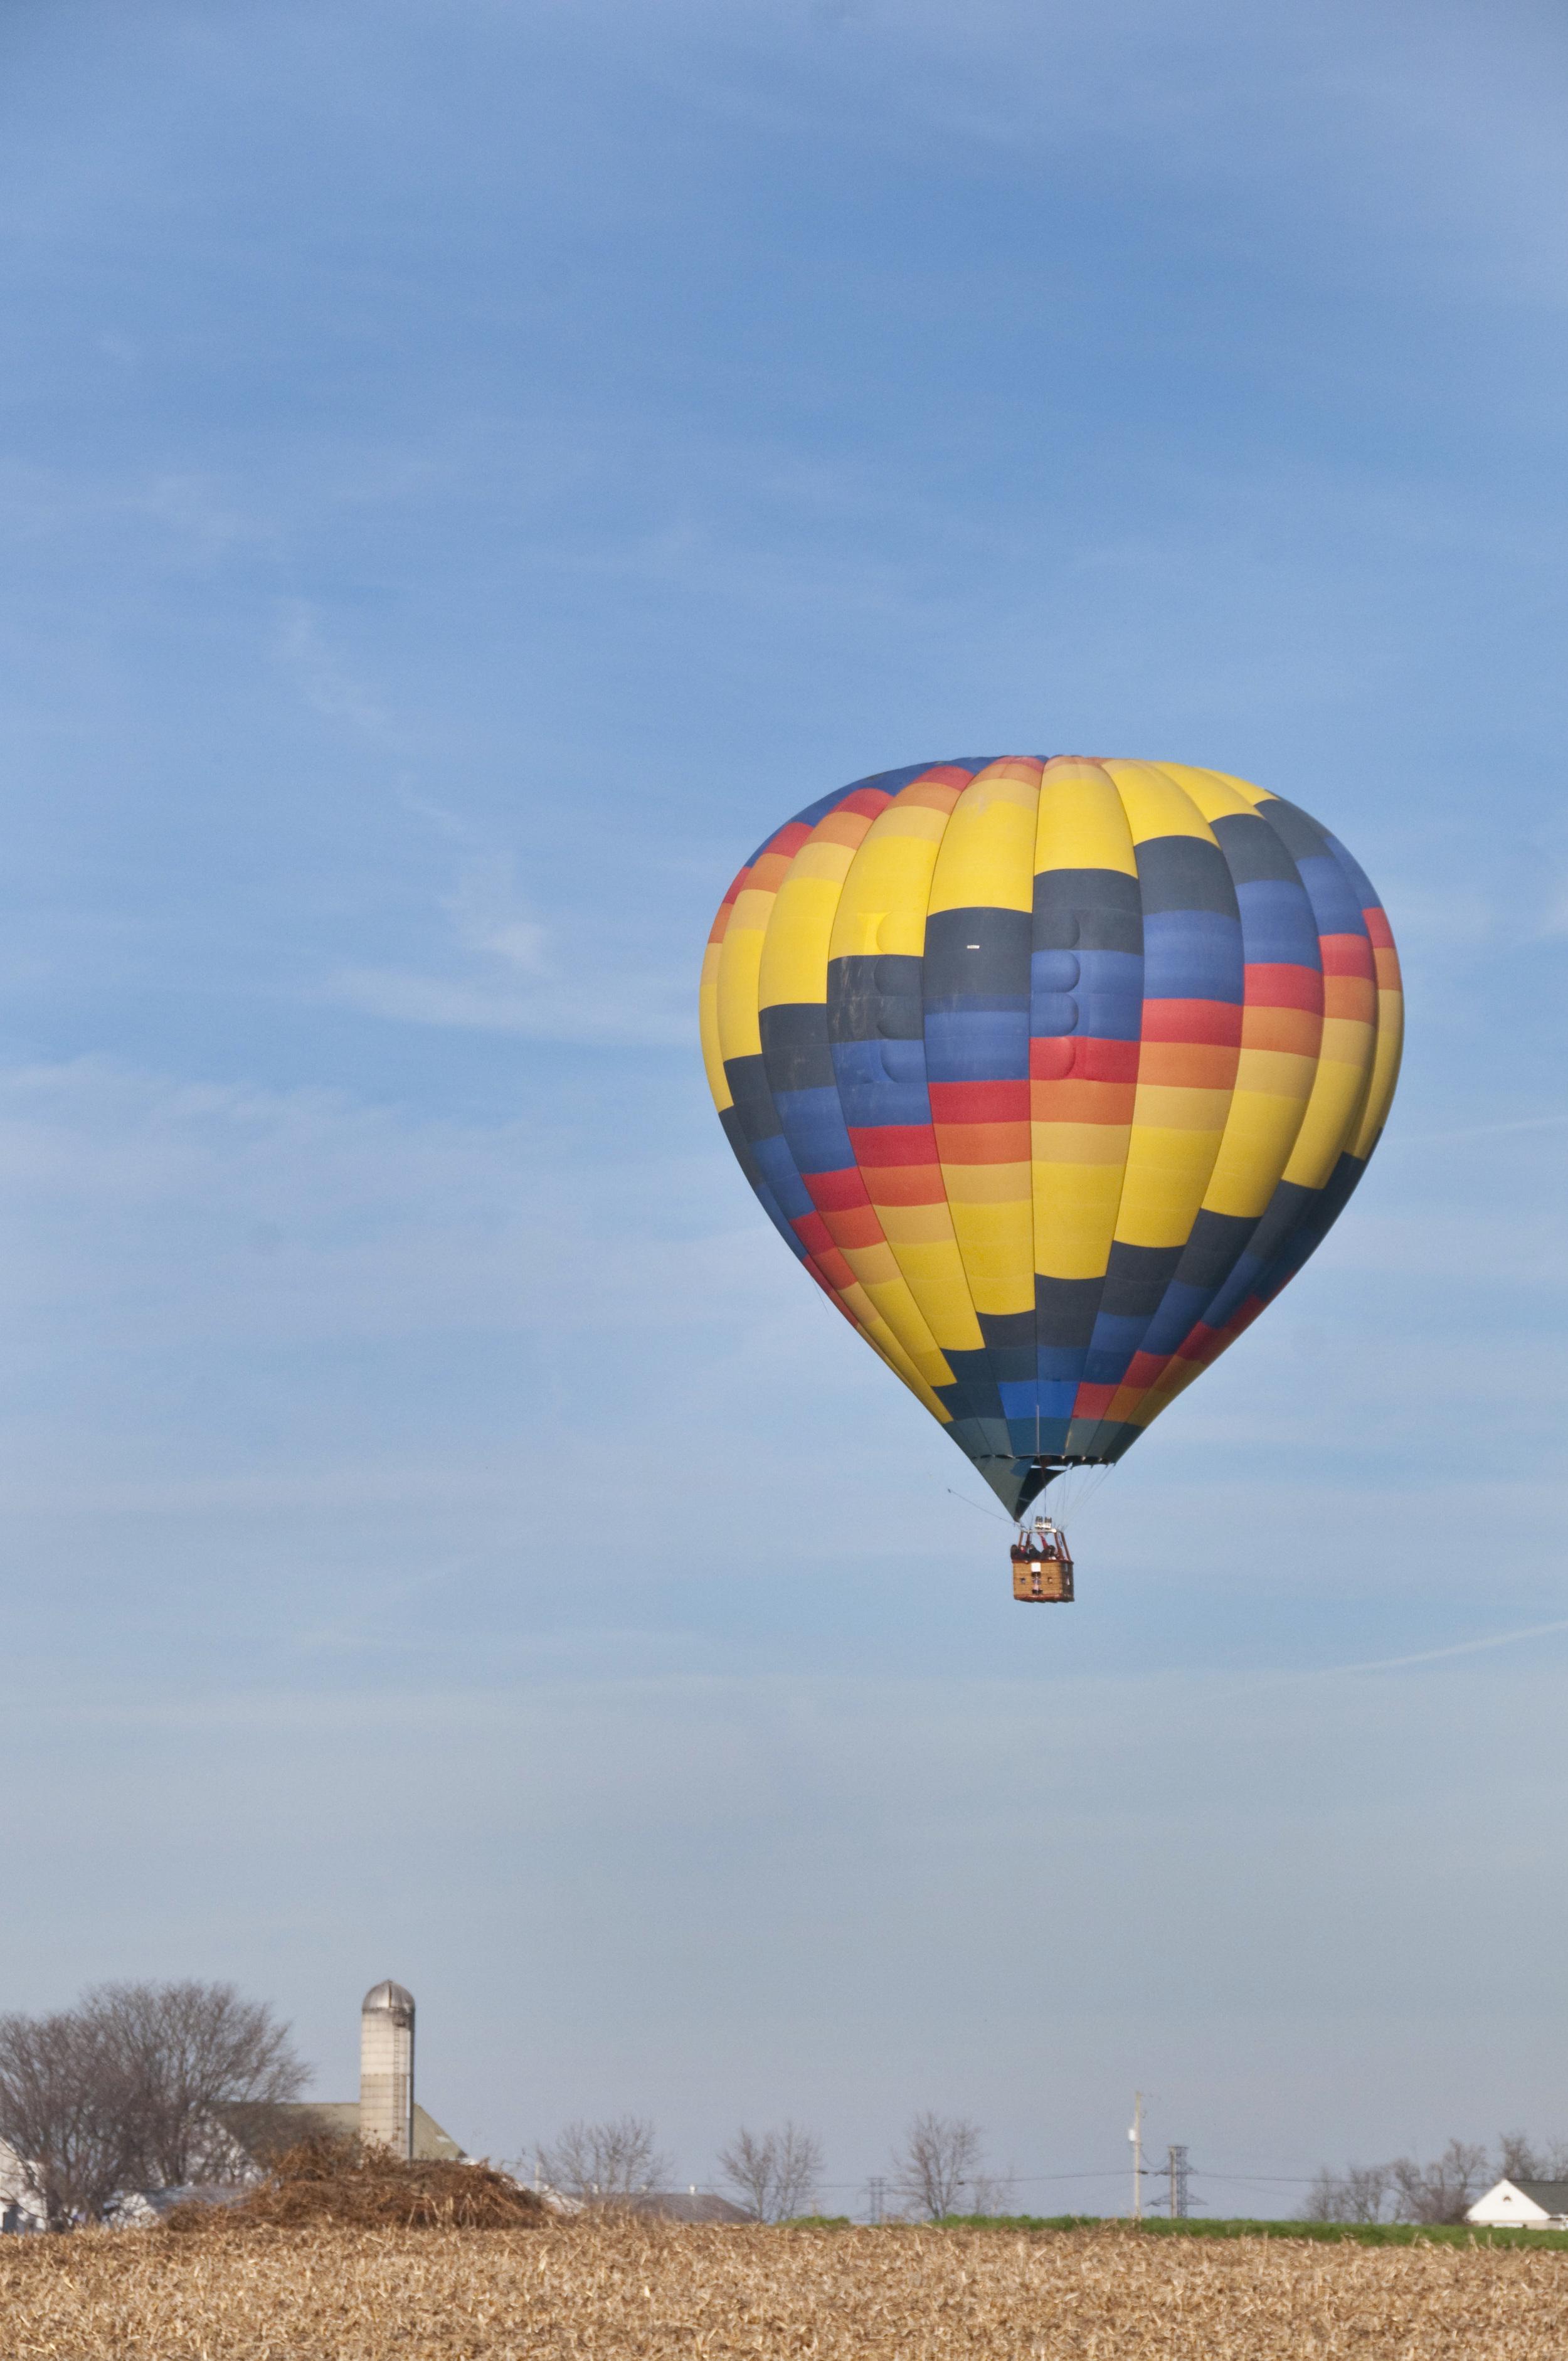 Lancaster hot air balloons